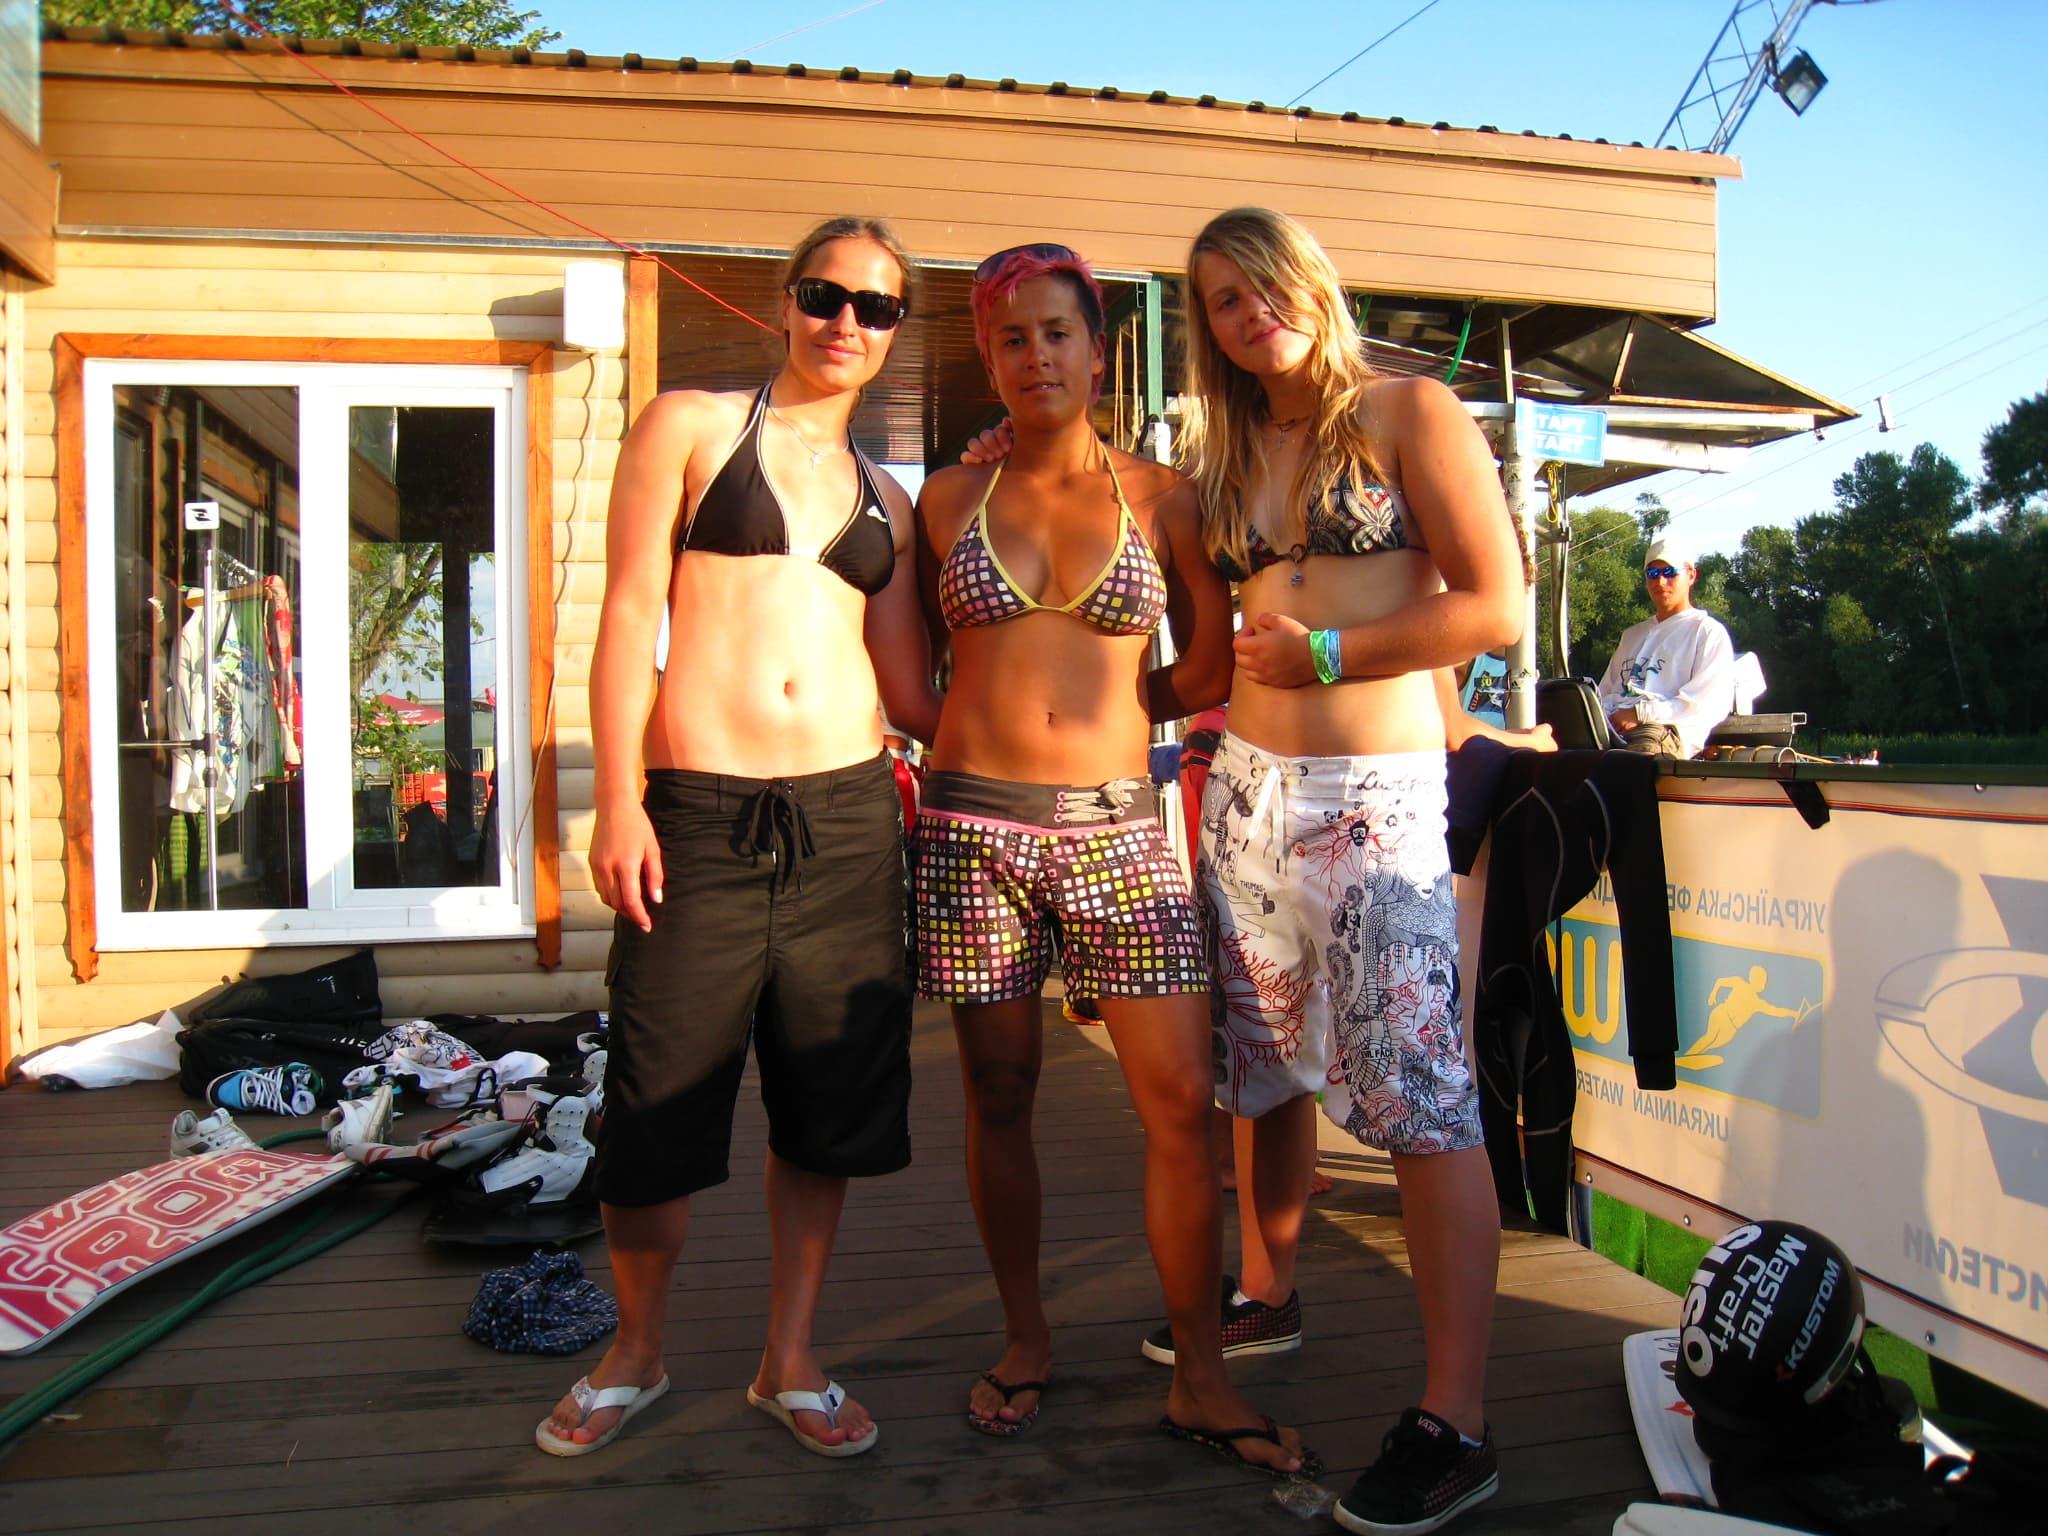 На фото чемпионка мира по вейкборду Максин Сапулетте, Ира Качала, Люба Буяновская